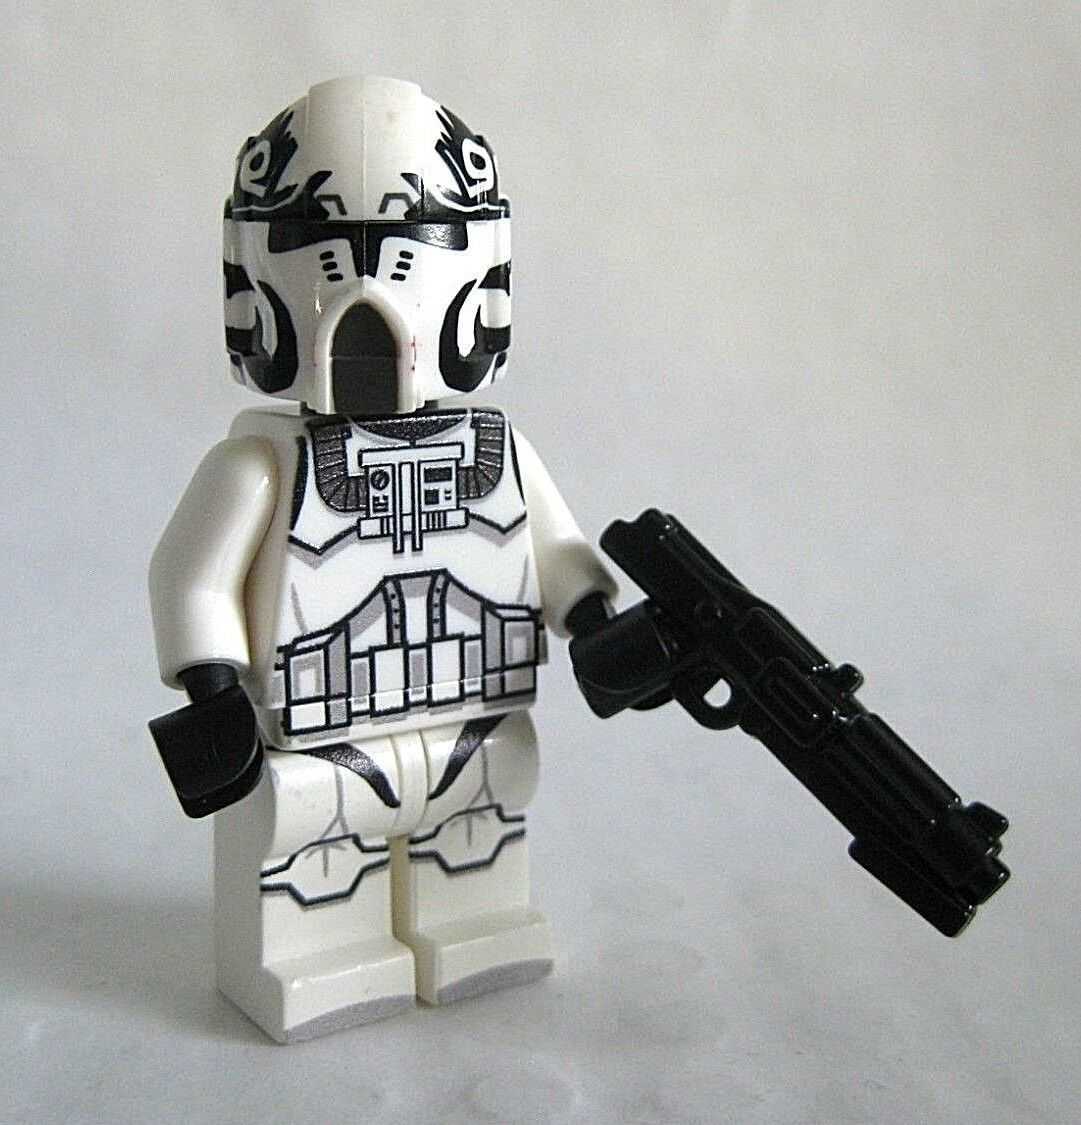 Lego SINKER Wolfpack Custom Printed Clone Minifigure W// Helmet Brickarms DC-15S